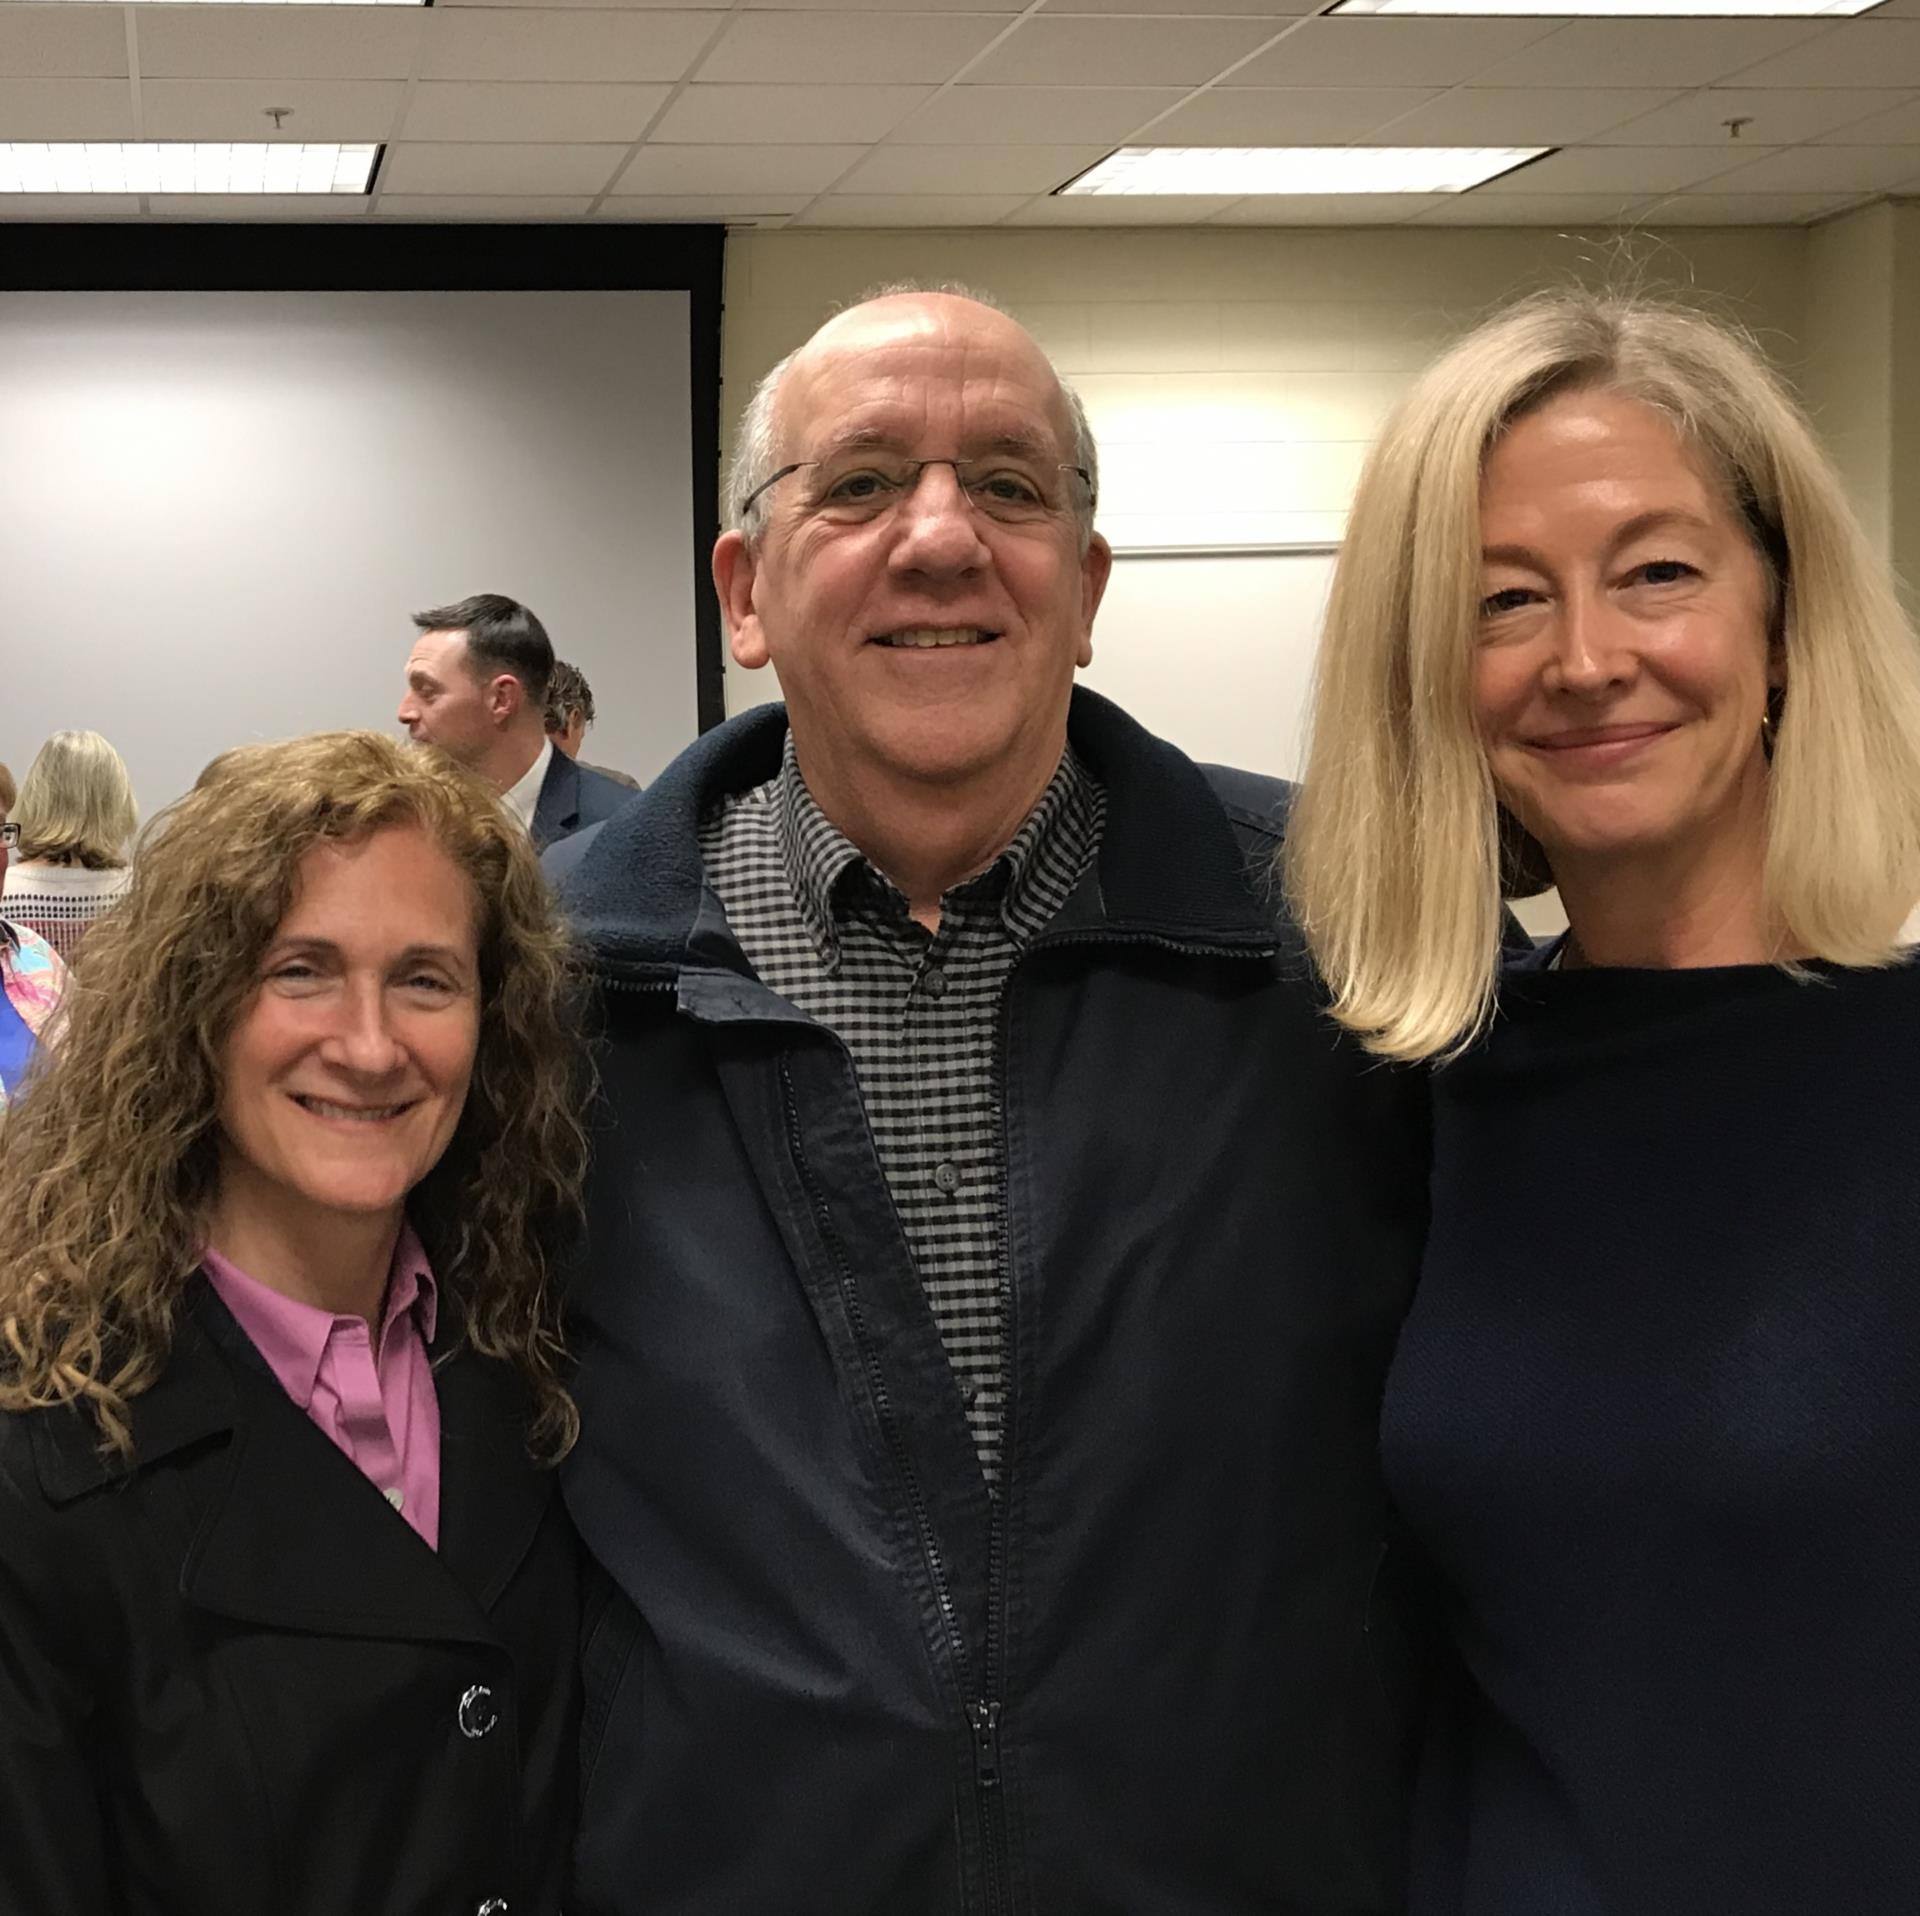 Marci, Lyle, Debbie